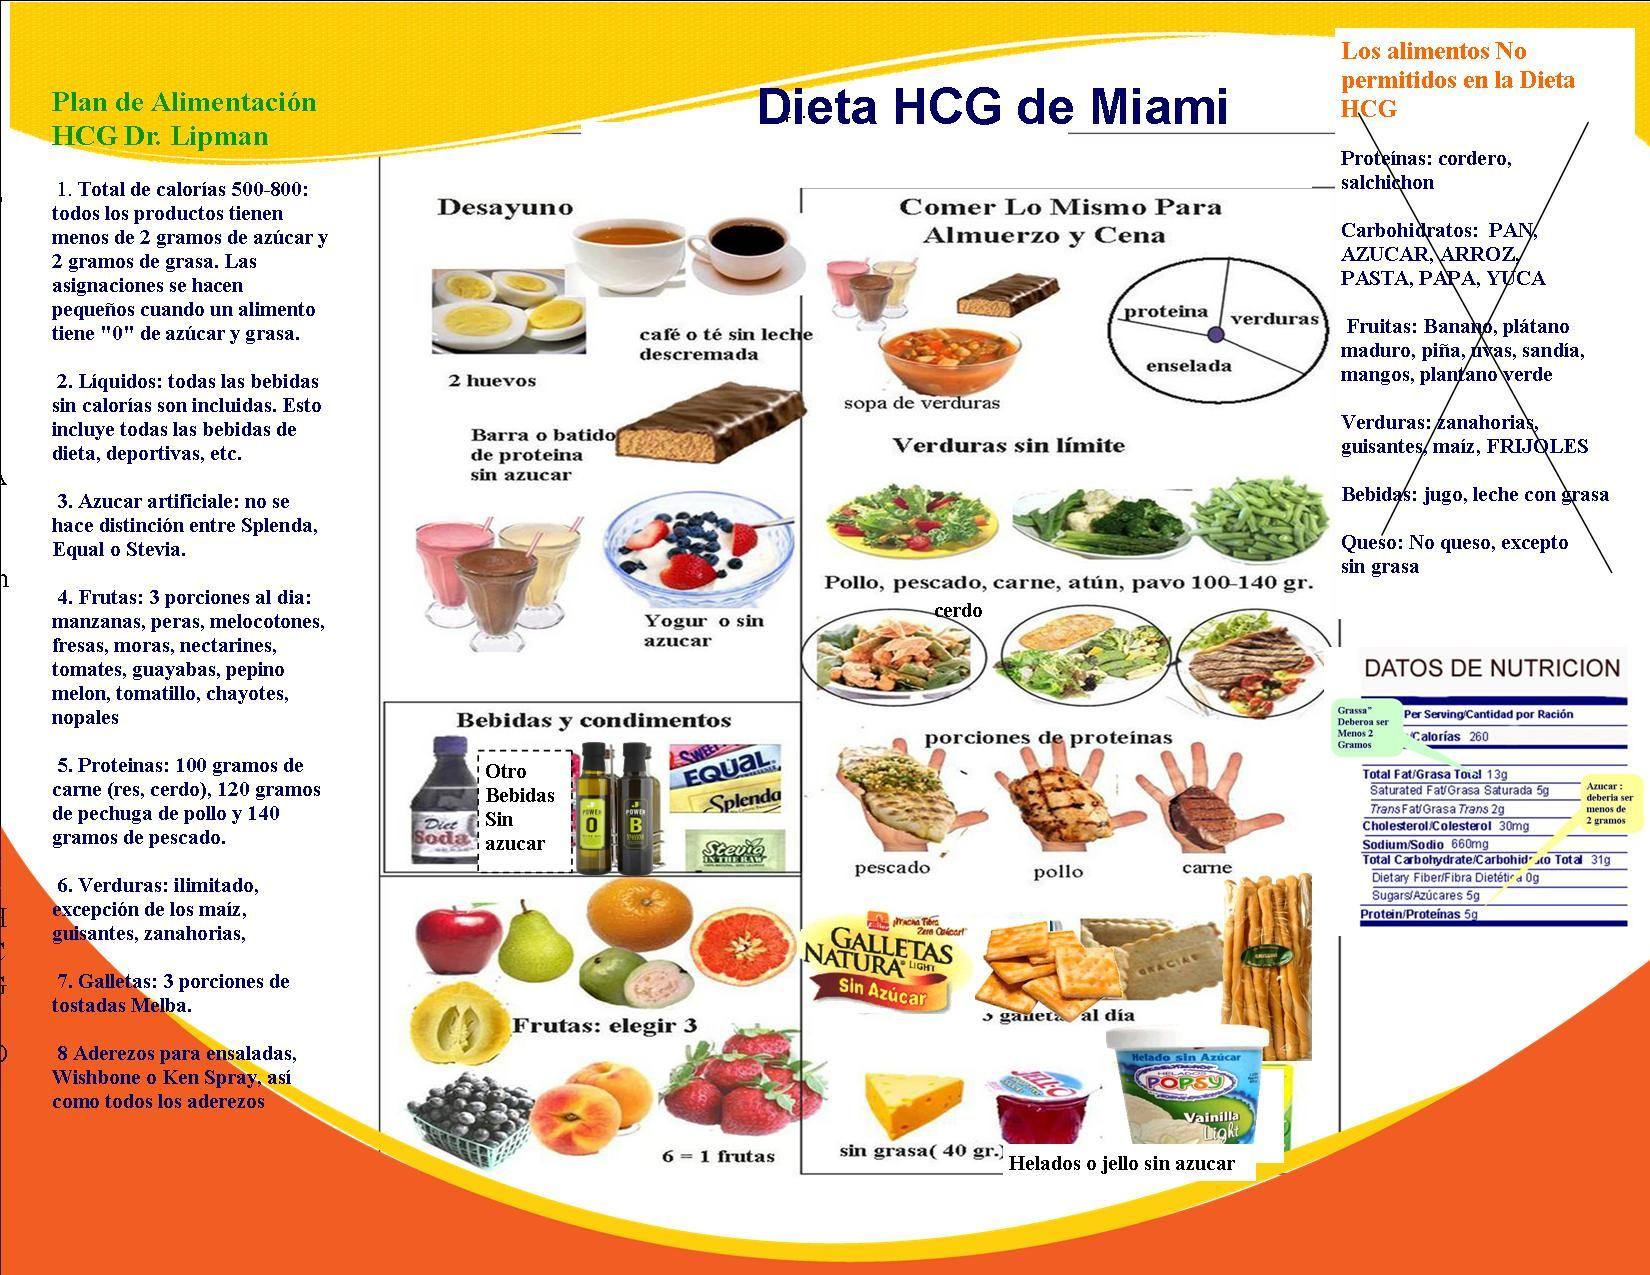 dr lipmans new 100 recipes on 800 calorie hcg diet hcg. Black Bedroom Furniture Sets. Home Design Ideas